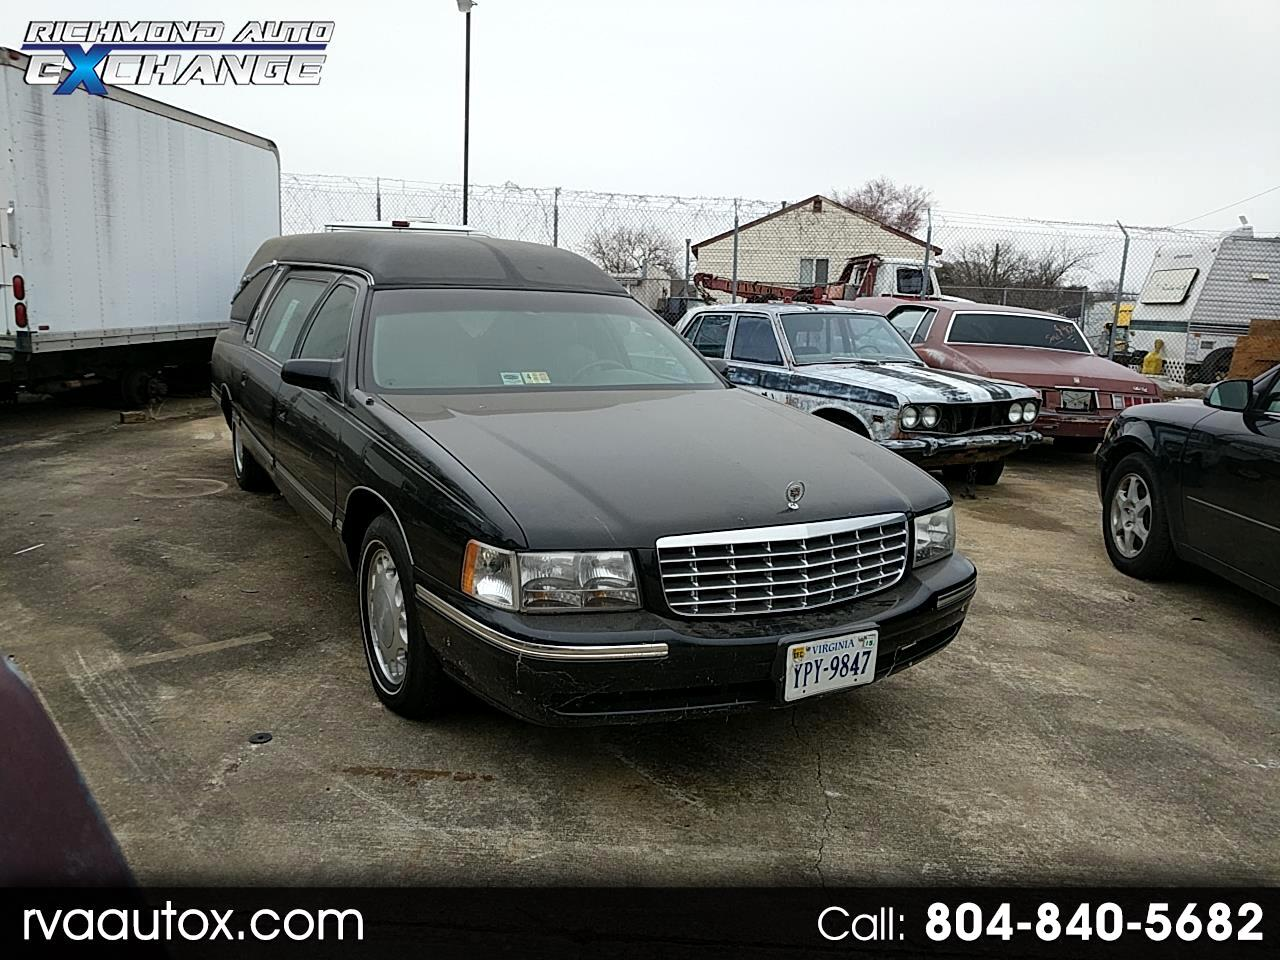 1999 Cadillac Hearse